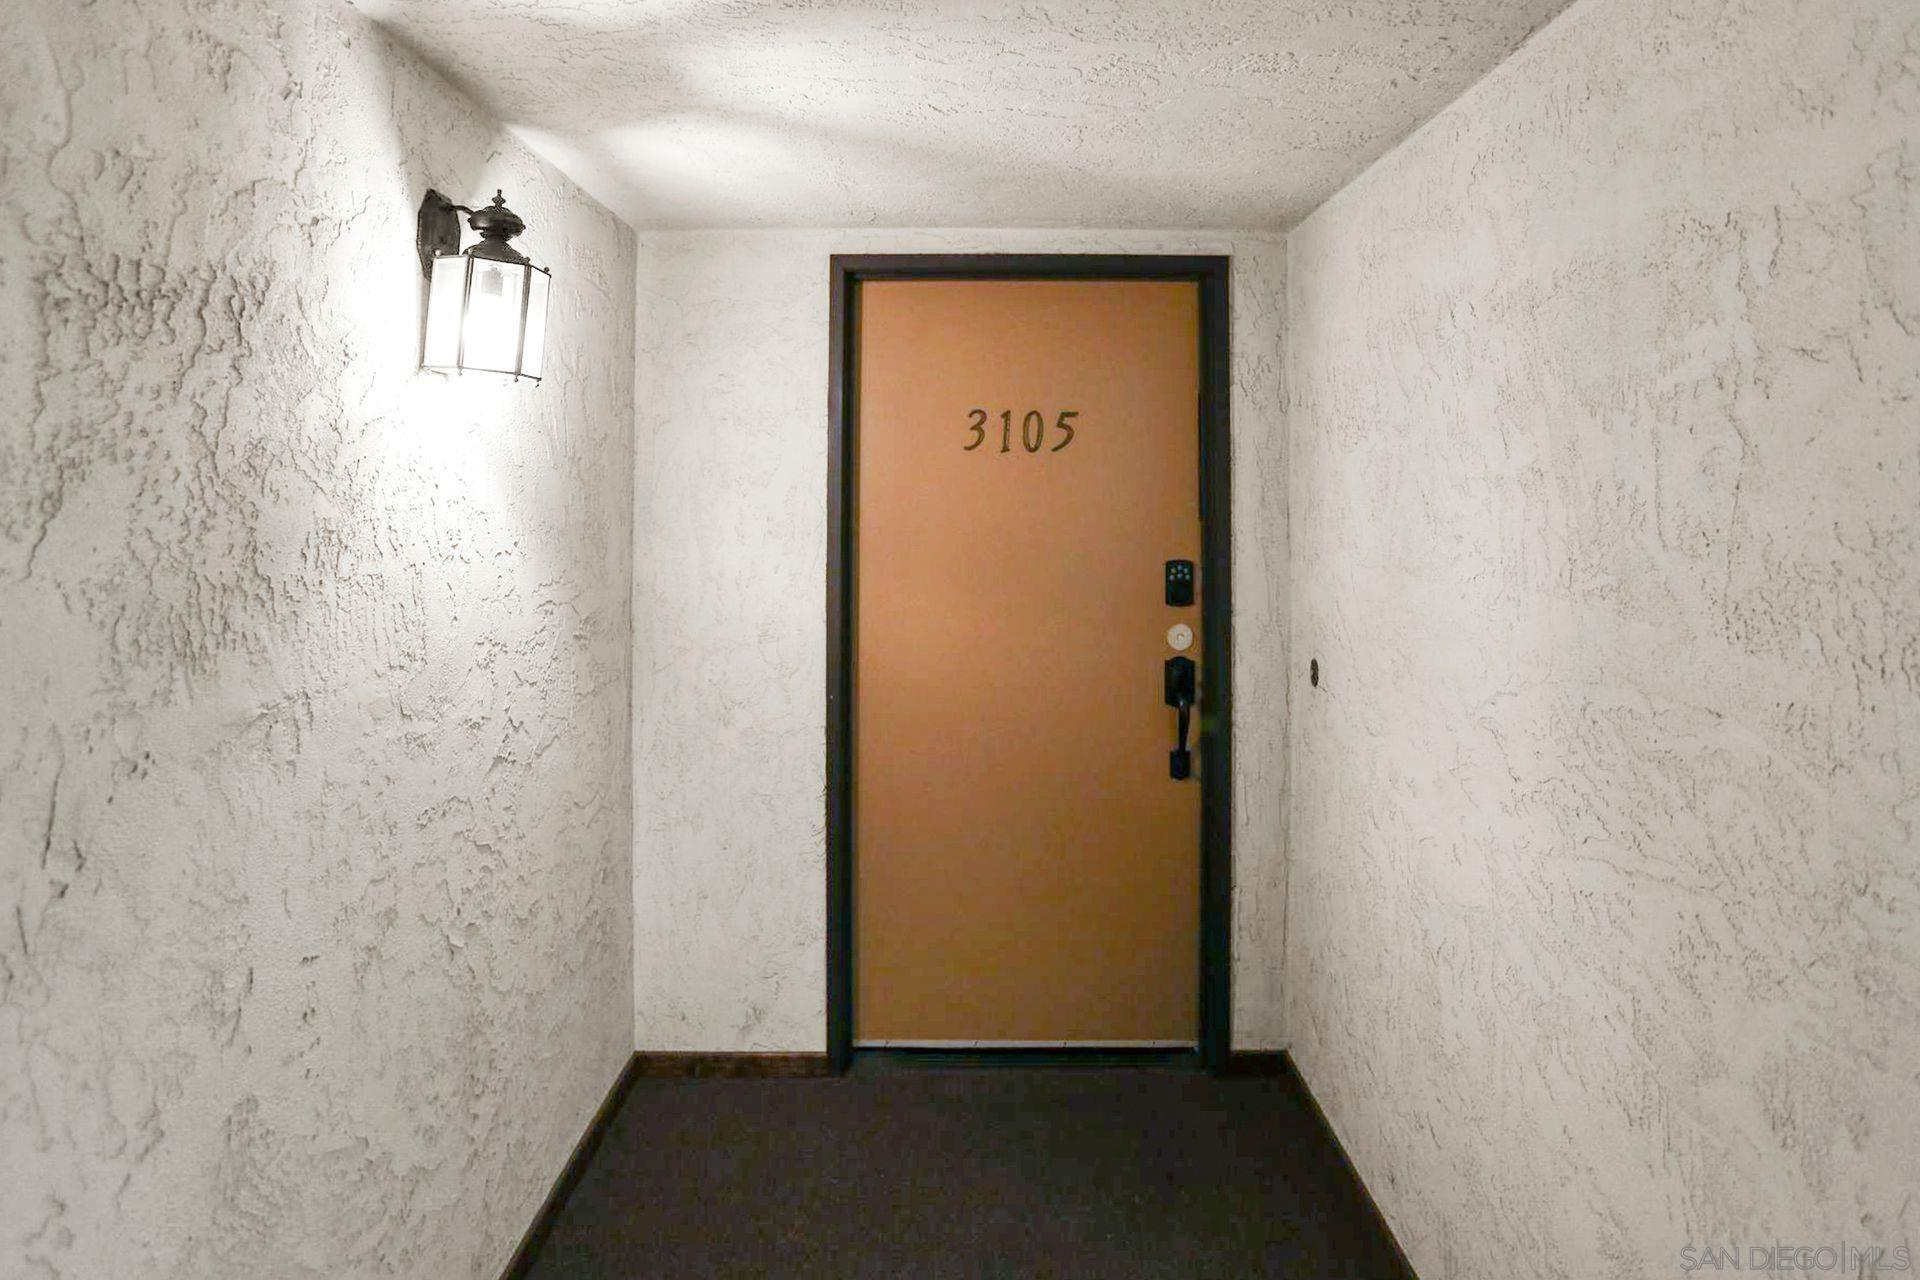 12290 Corte Sabio Unit 3105, San Diego CA 92128